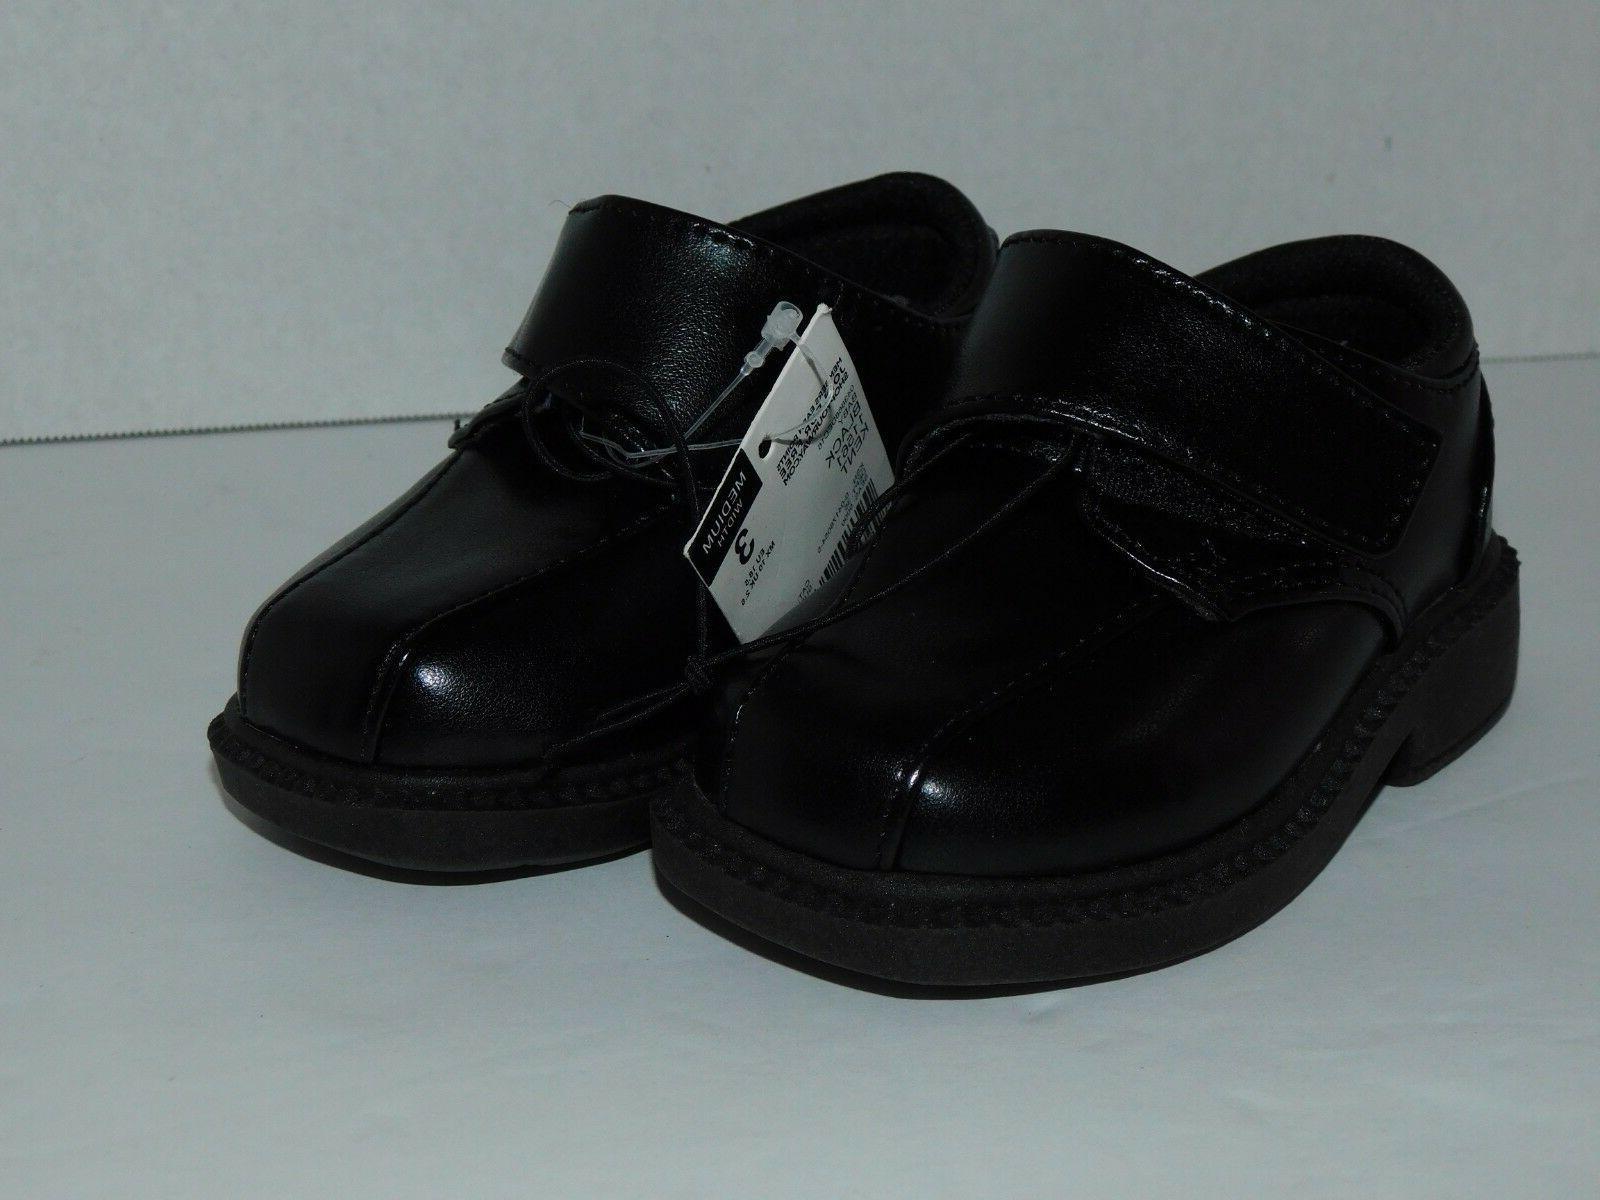 Boys Infant Toddler Dress Shoes 2 Black Holiday